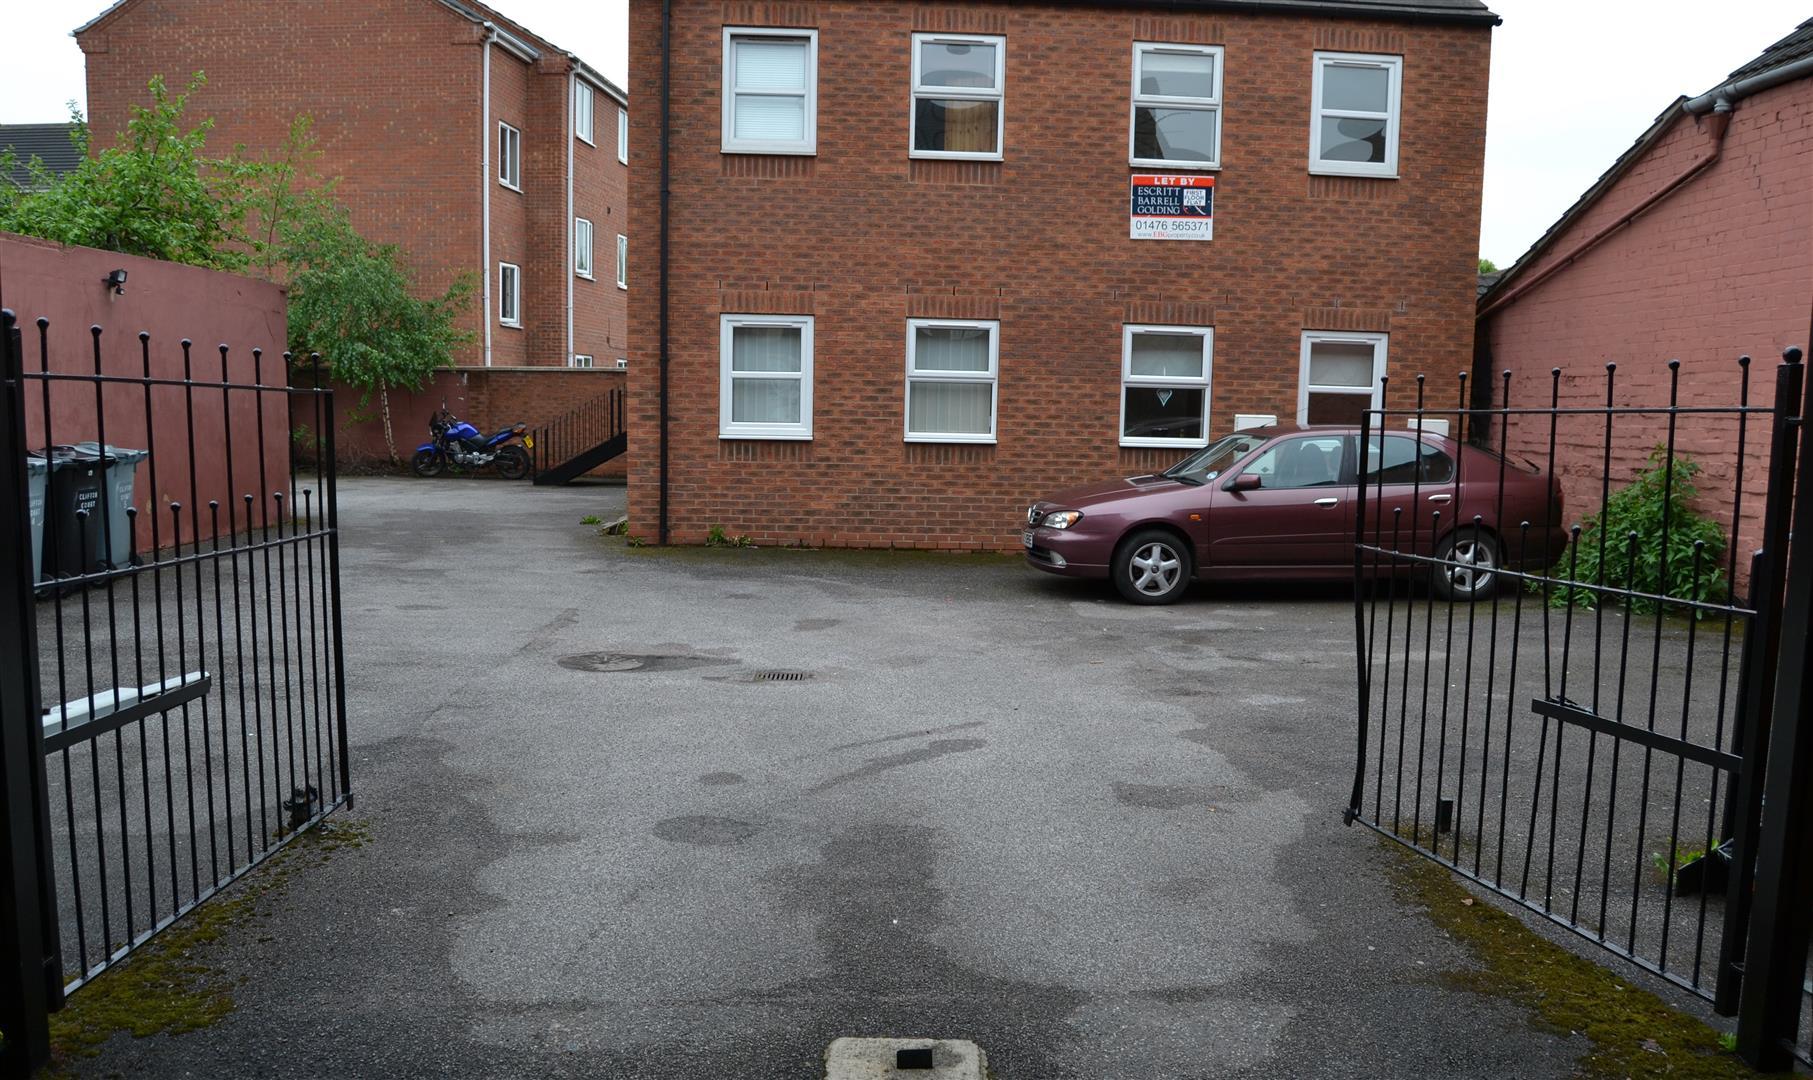 1 bedroom property in Grantham